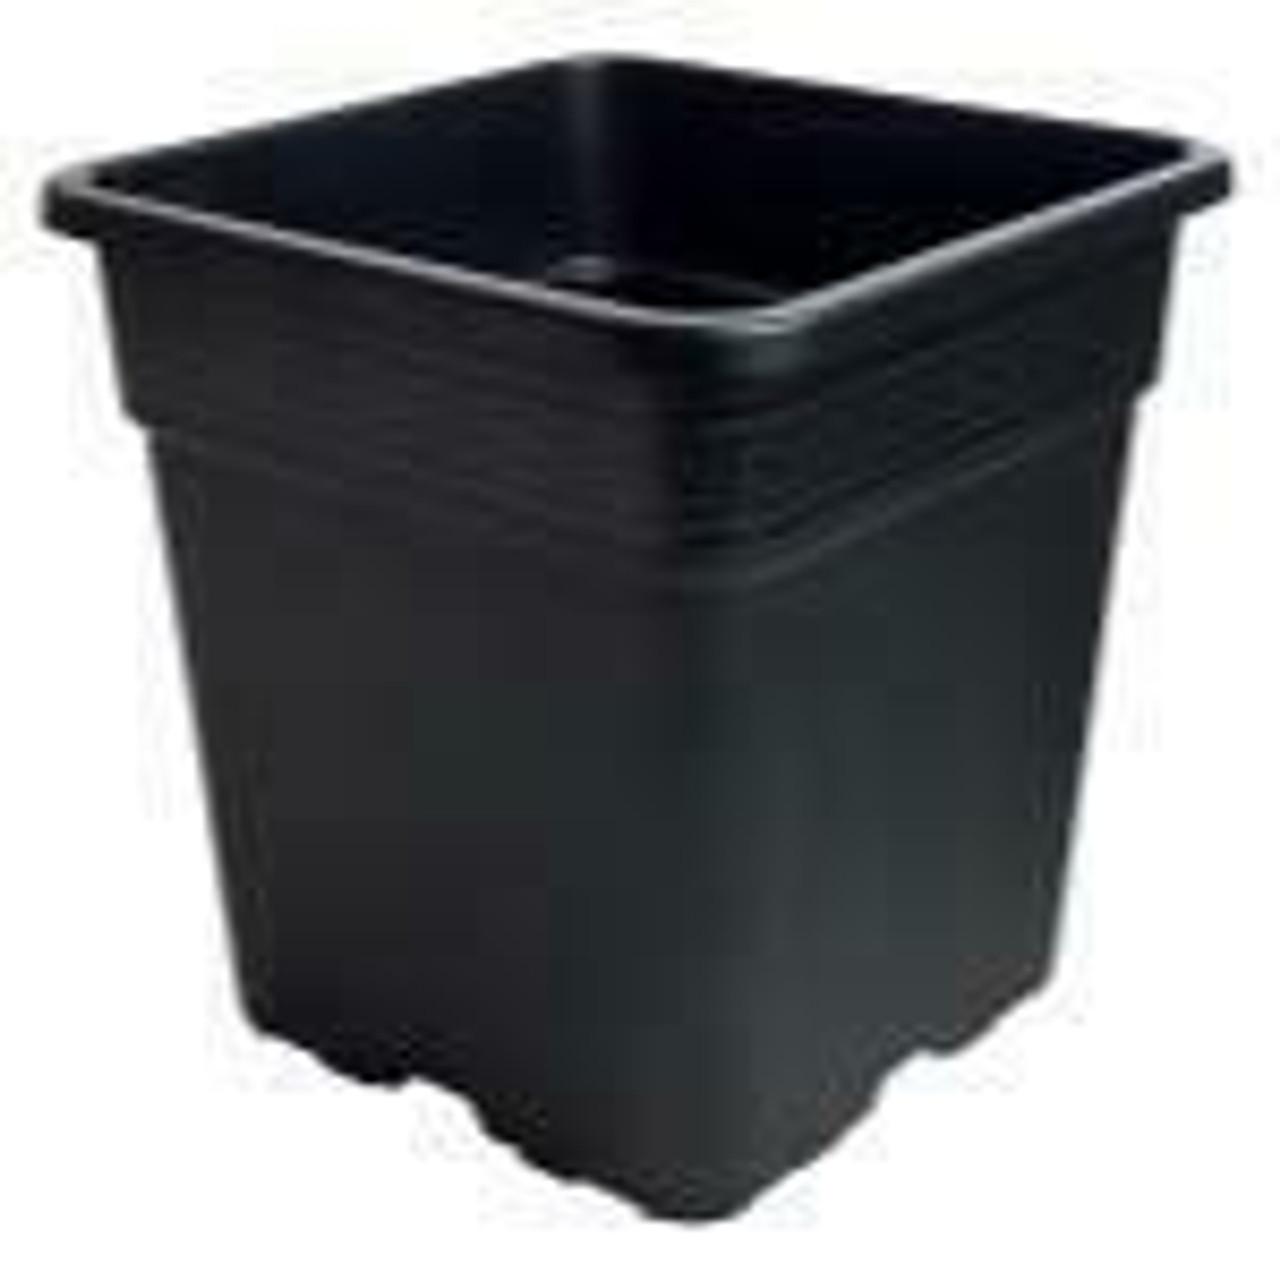 Gro Pro Black Square Pot 2 Gallon - 1